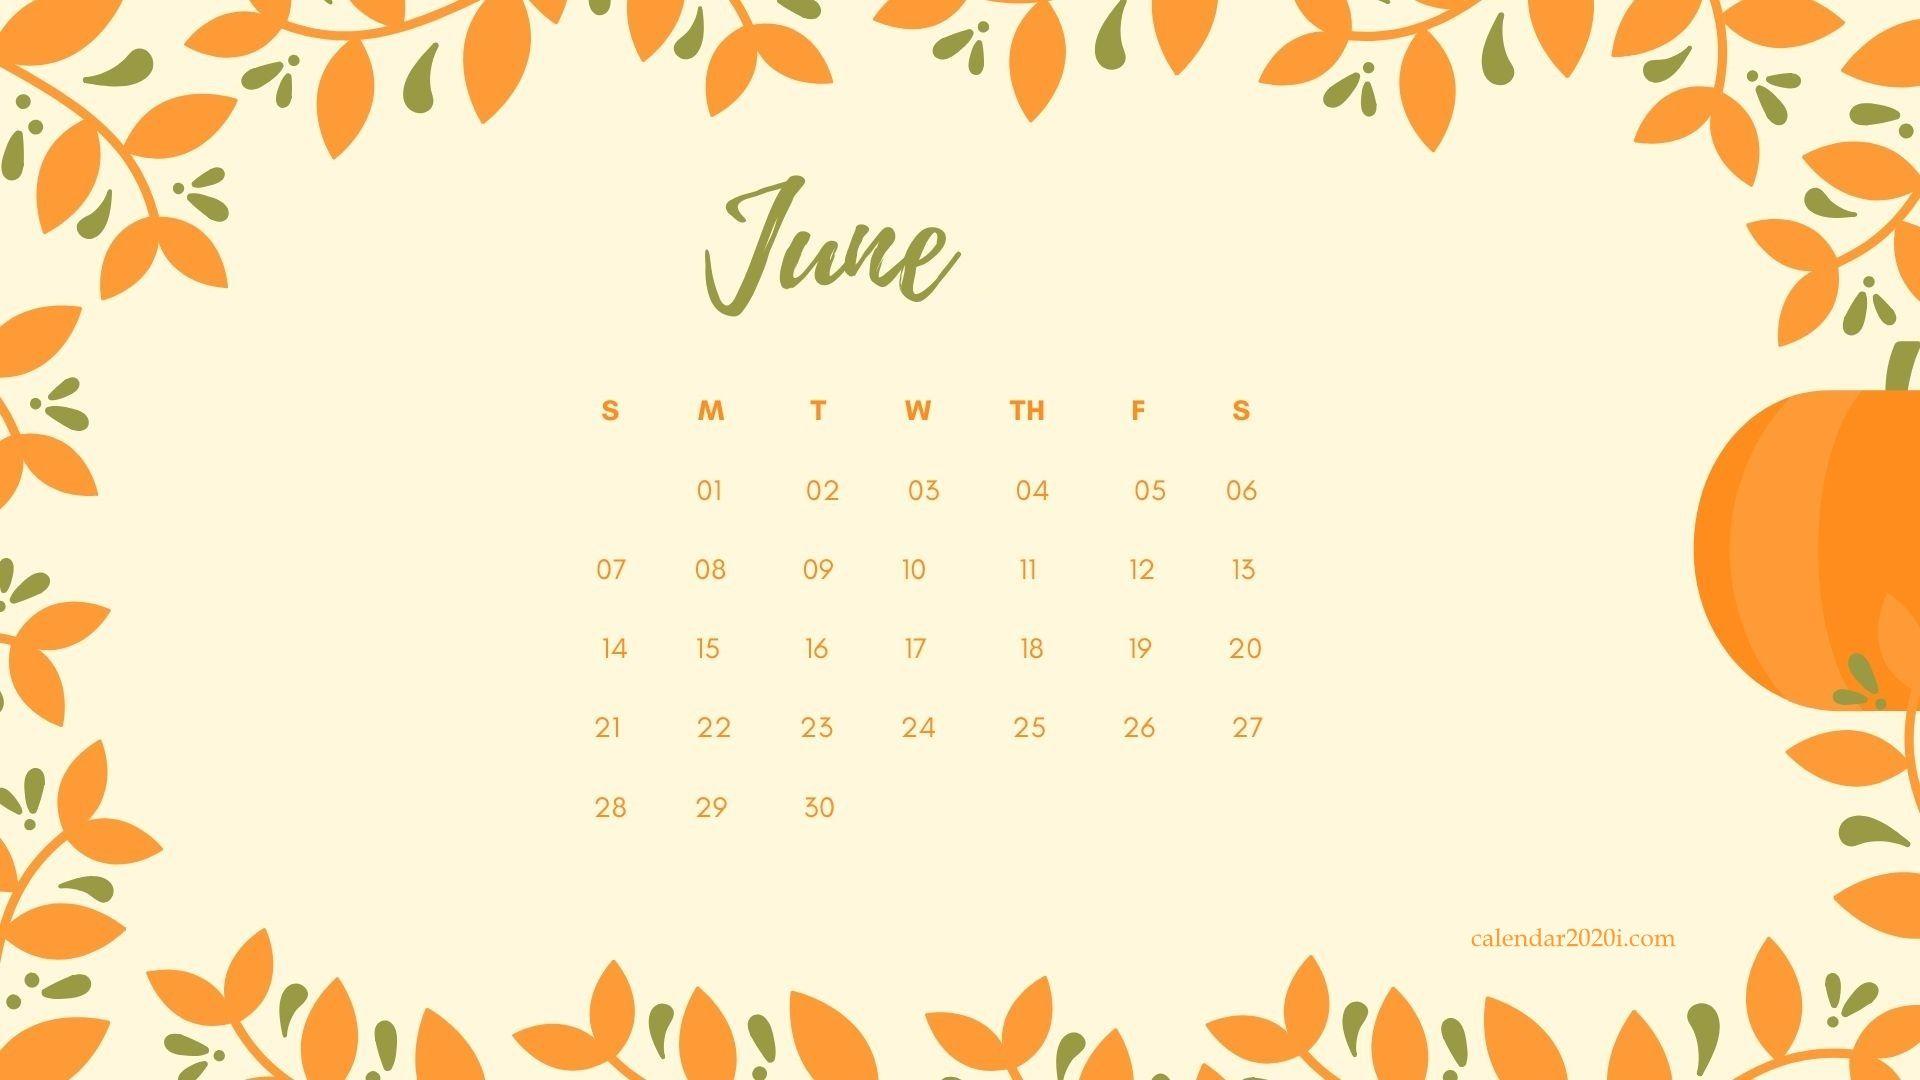 Cute June 2020 Calendar for Desktop